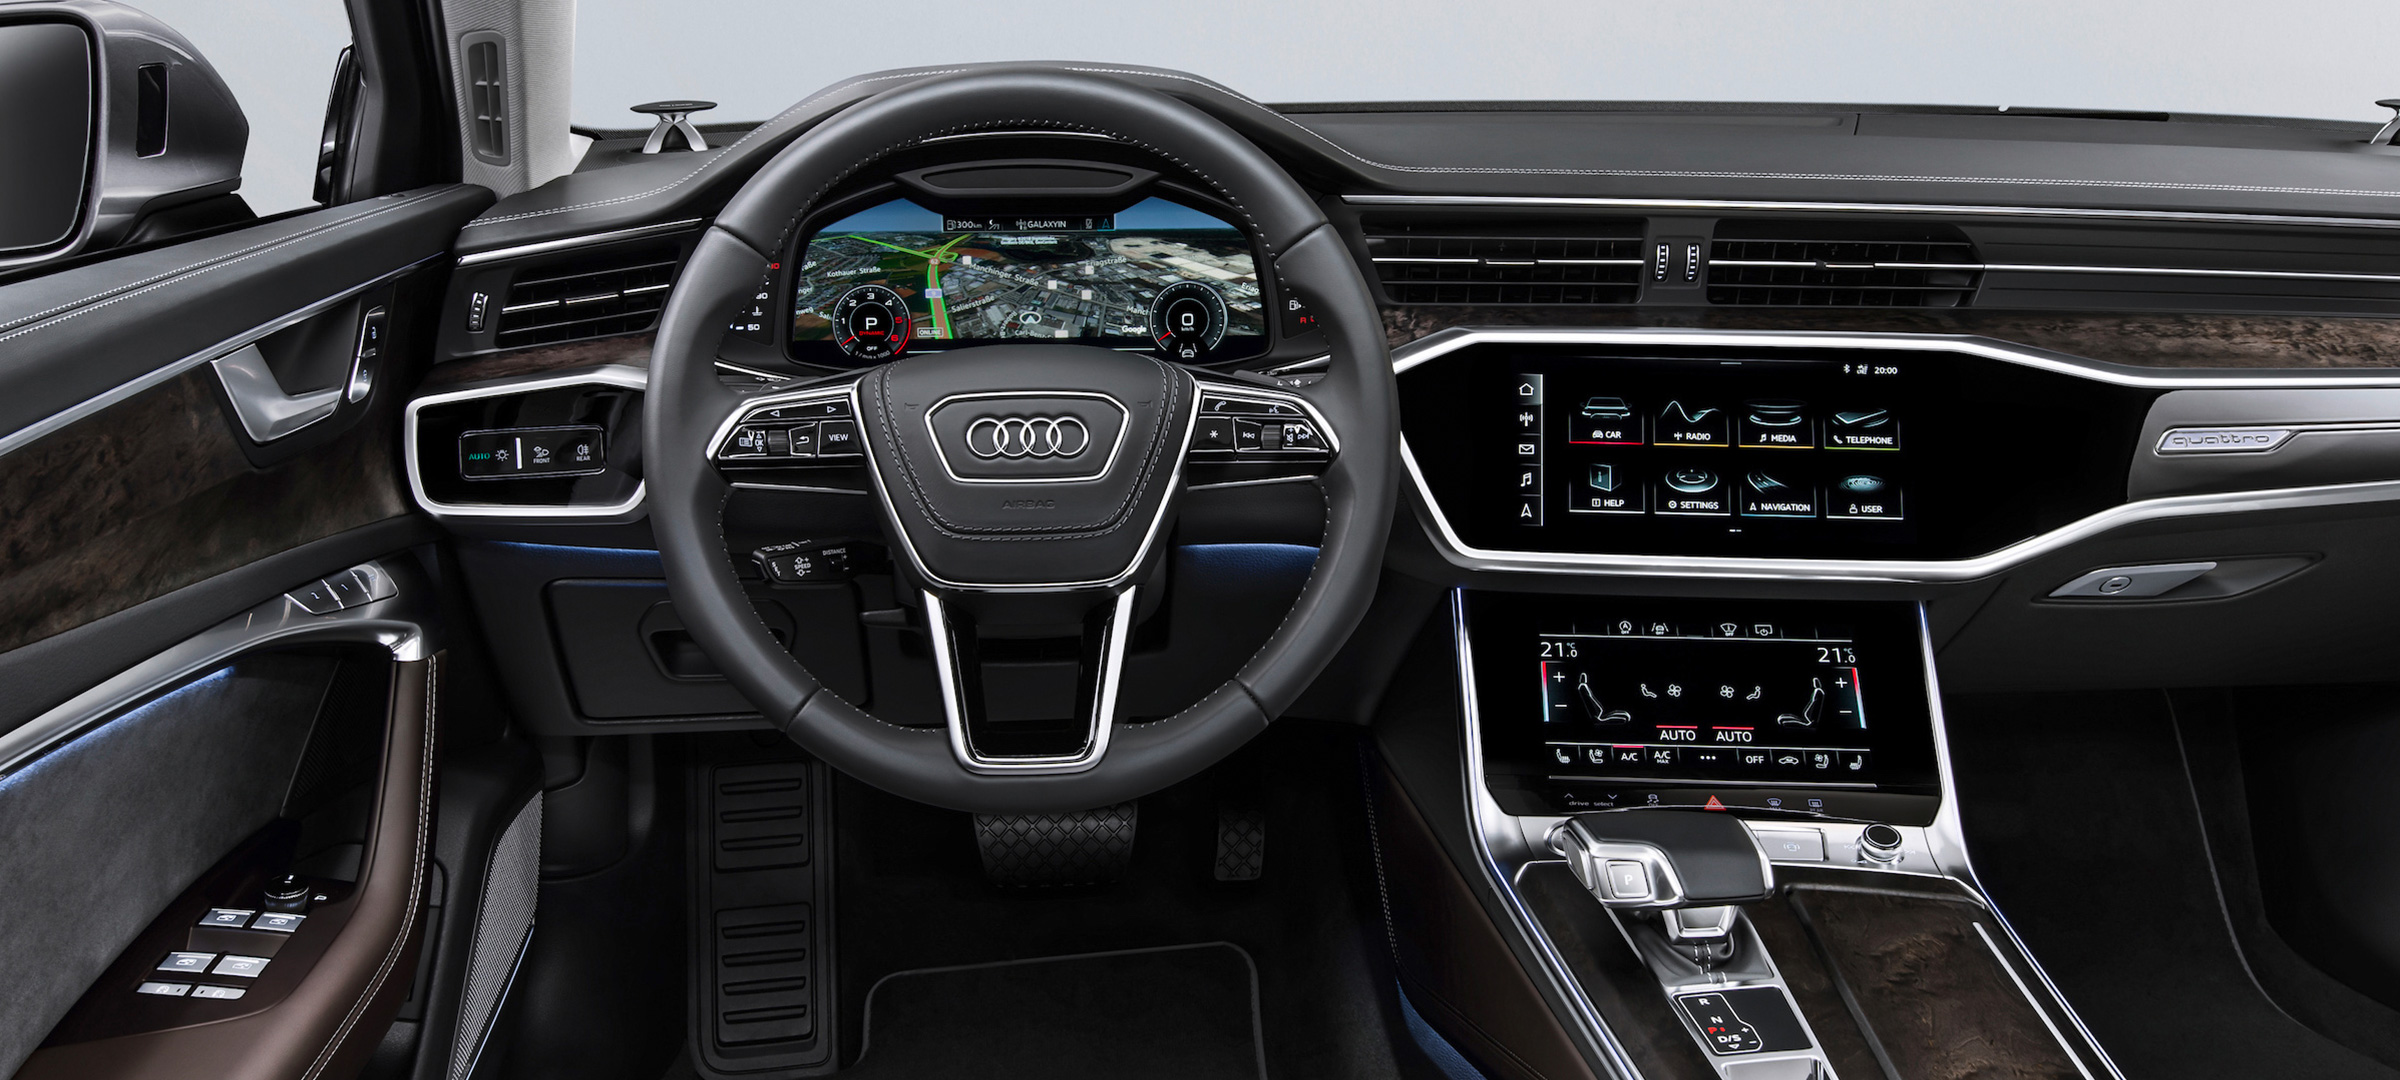 Audi A6 Sedan bakom ratten